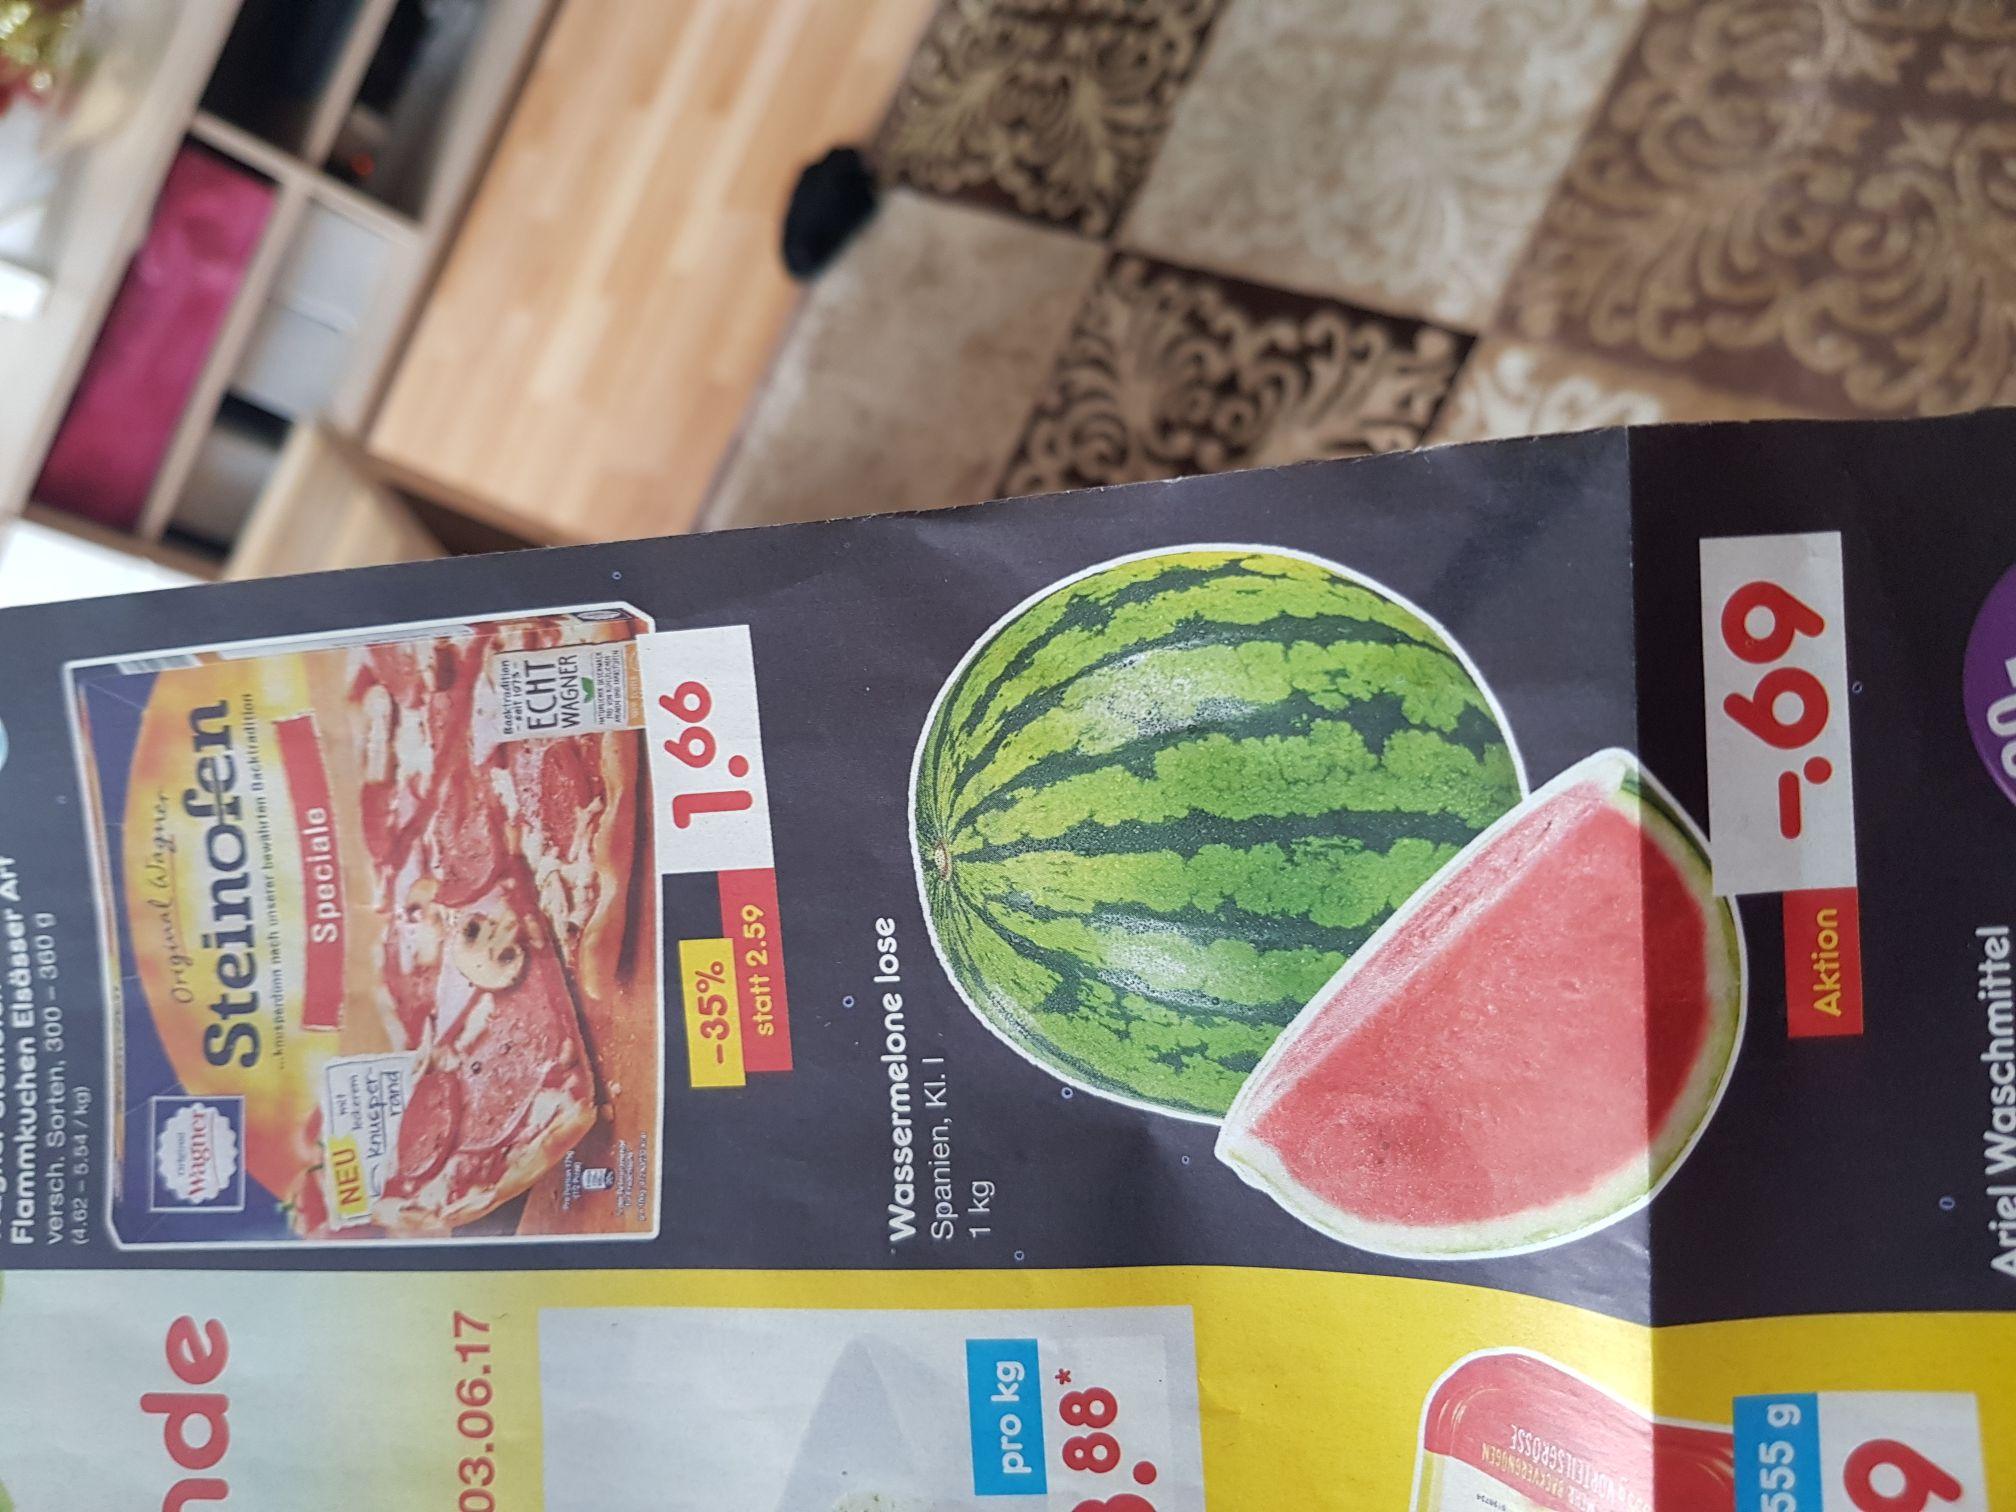 Netto Bielefeld Wassermelone kg 0.69€ ab 01.06.2017